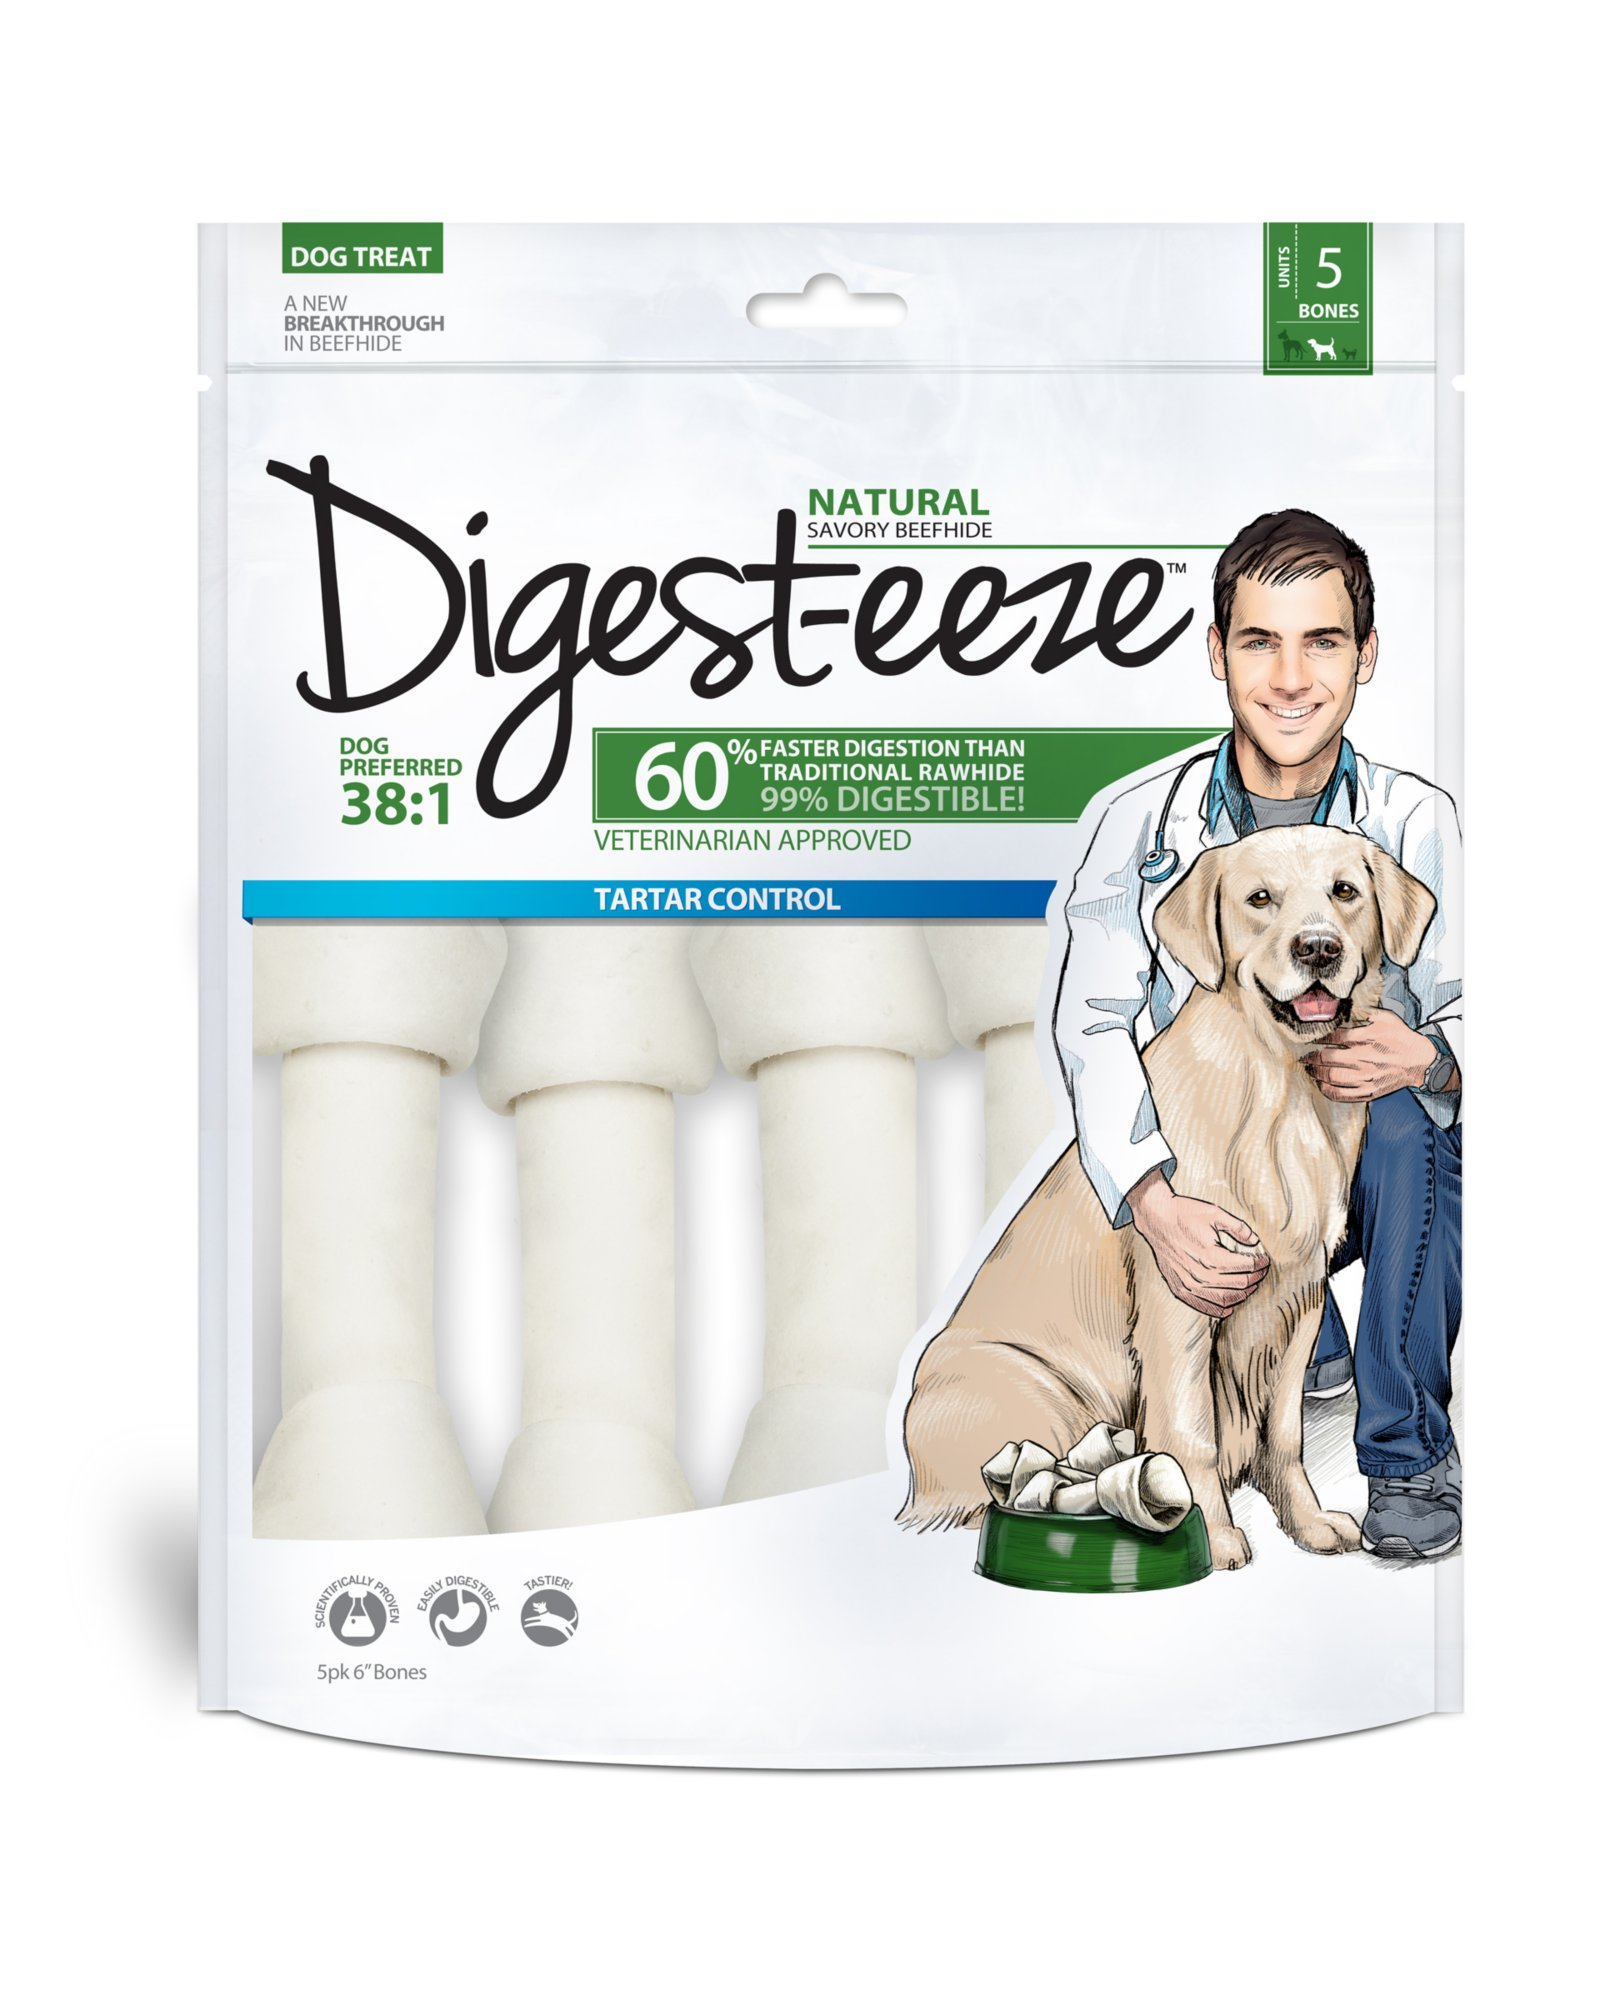 Digest-eeze 5-Pack Rawhide Bones Dog Treats